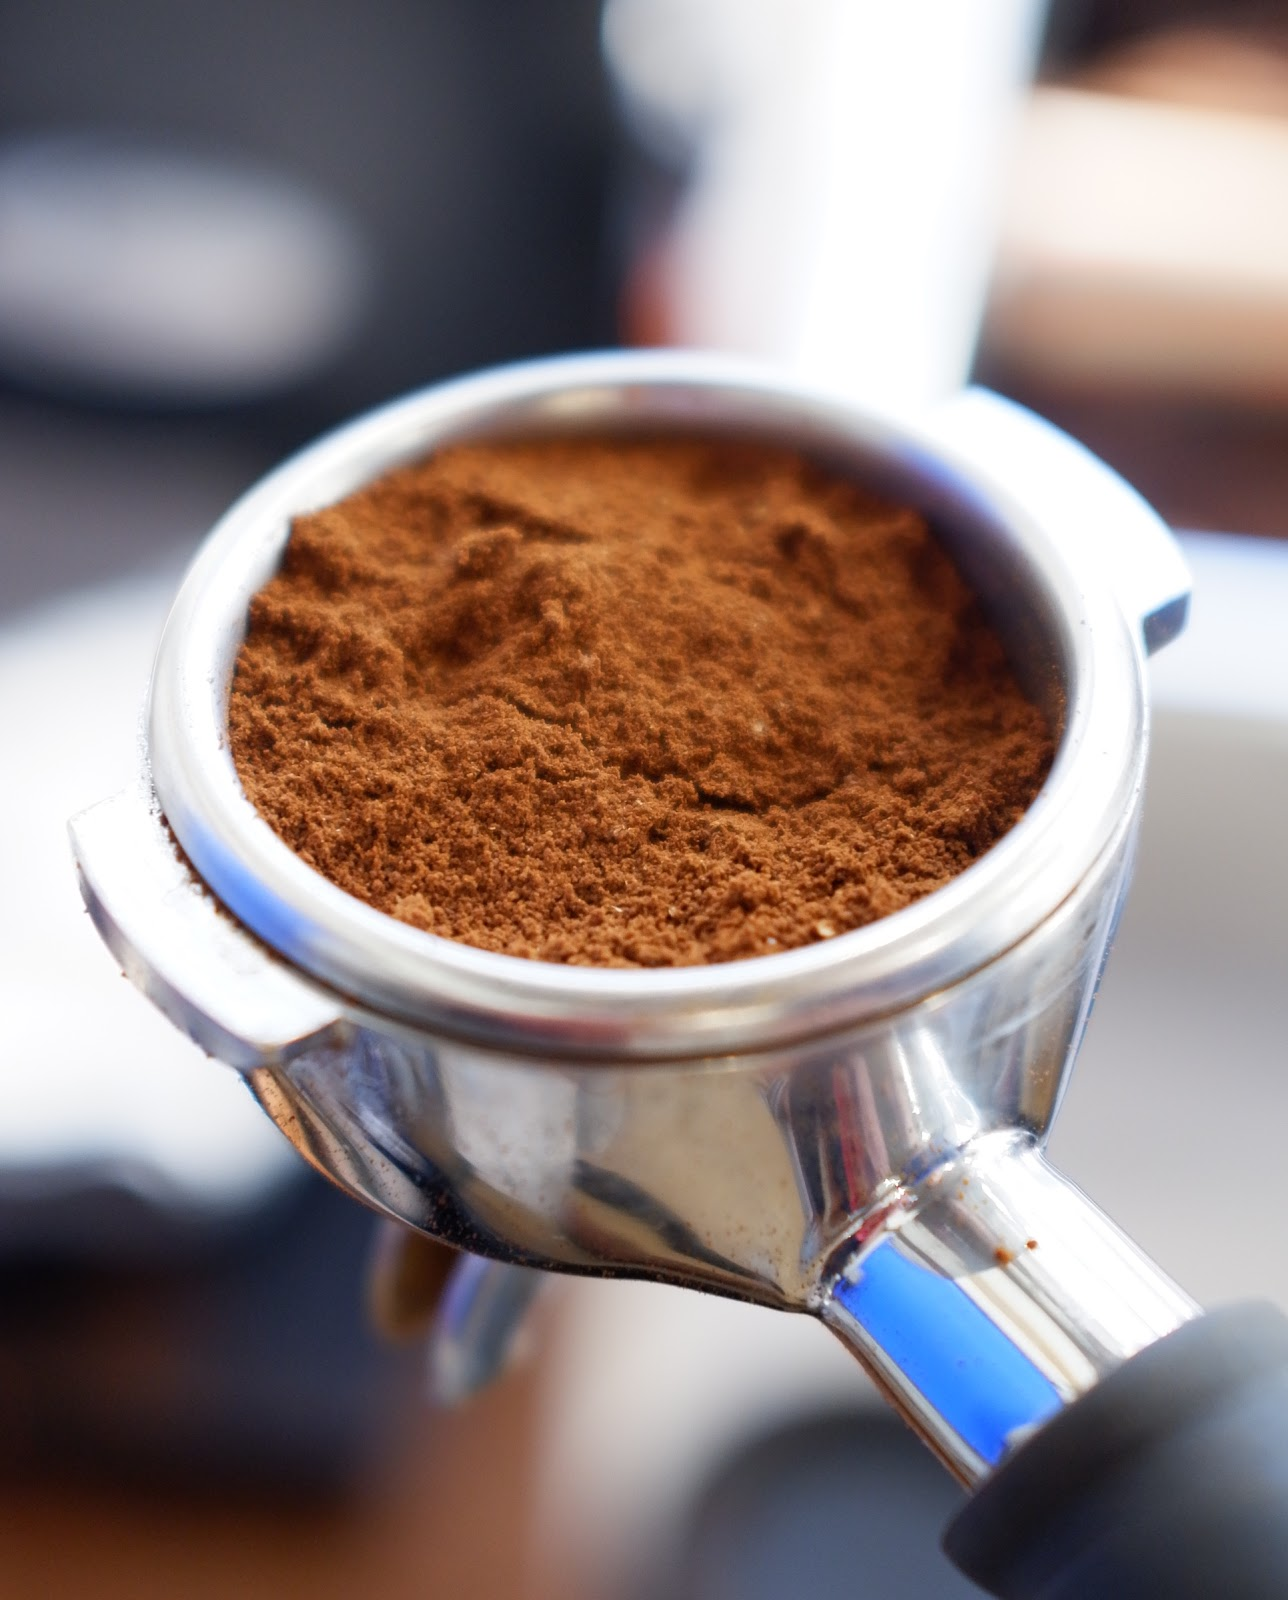 How To Make Barista-Quality Espresso at Home | Perfect ...